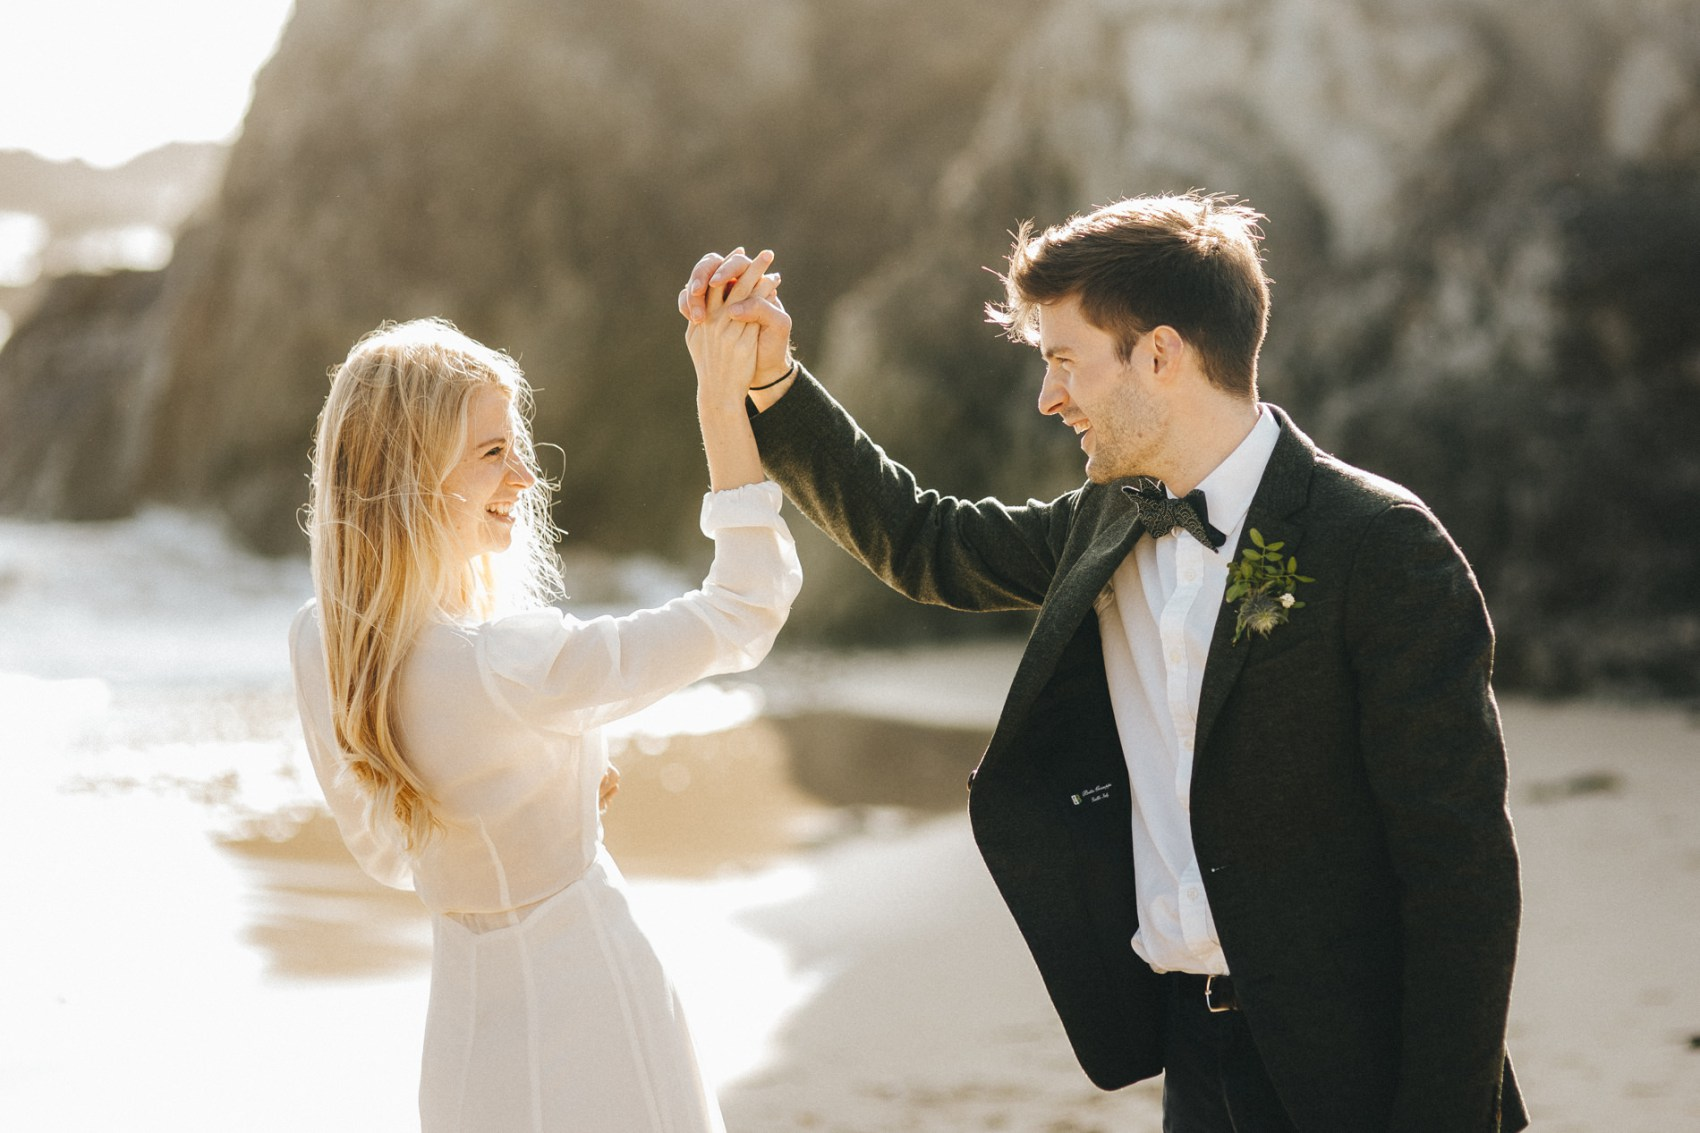 intimate-wedding-la-baule-pouliguen-mariage-116.jpg